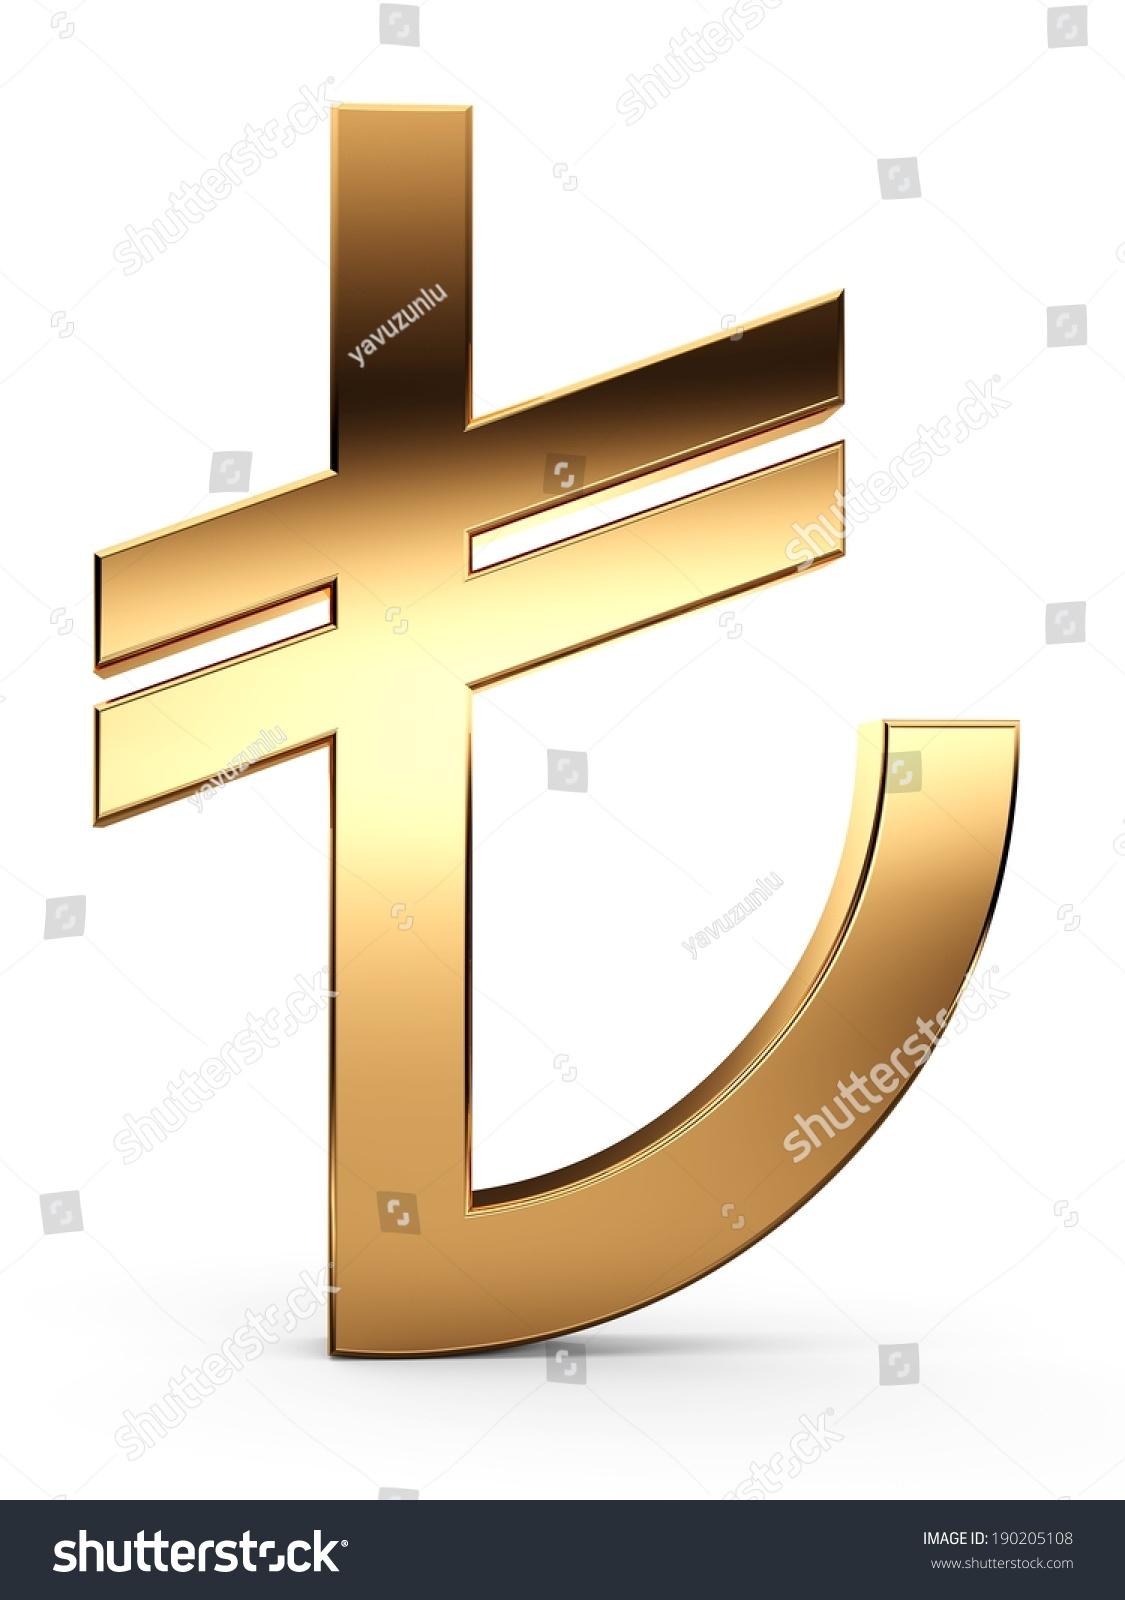 Turkish lira currency symbol gallery symbol and sign ideas 3d golden tl symbol turkish lira stock illustration 190205108 3d golden tl symbol turkish lira turkish buycottarizona